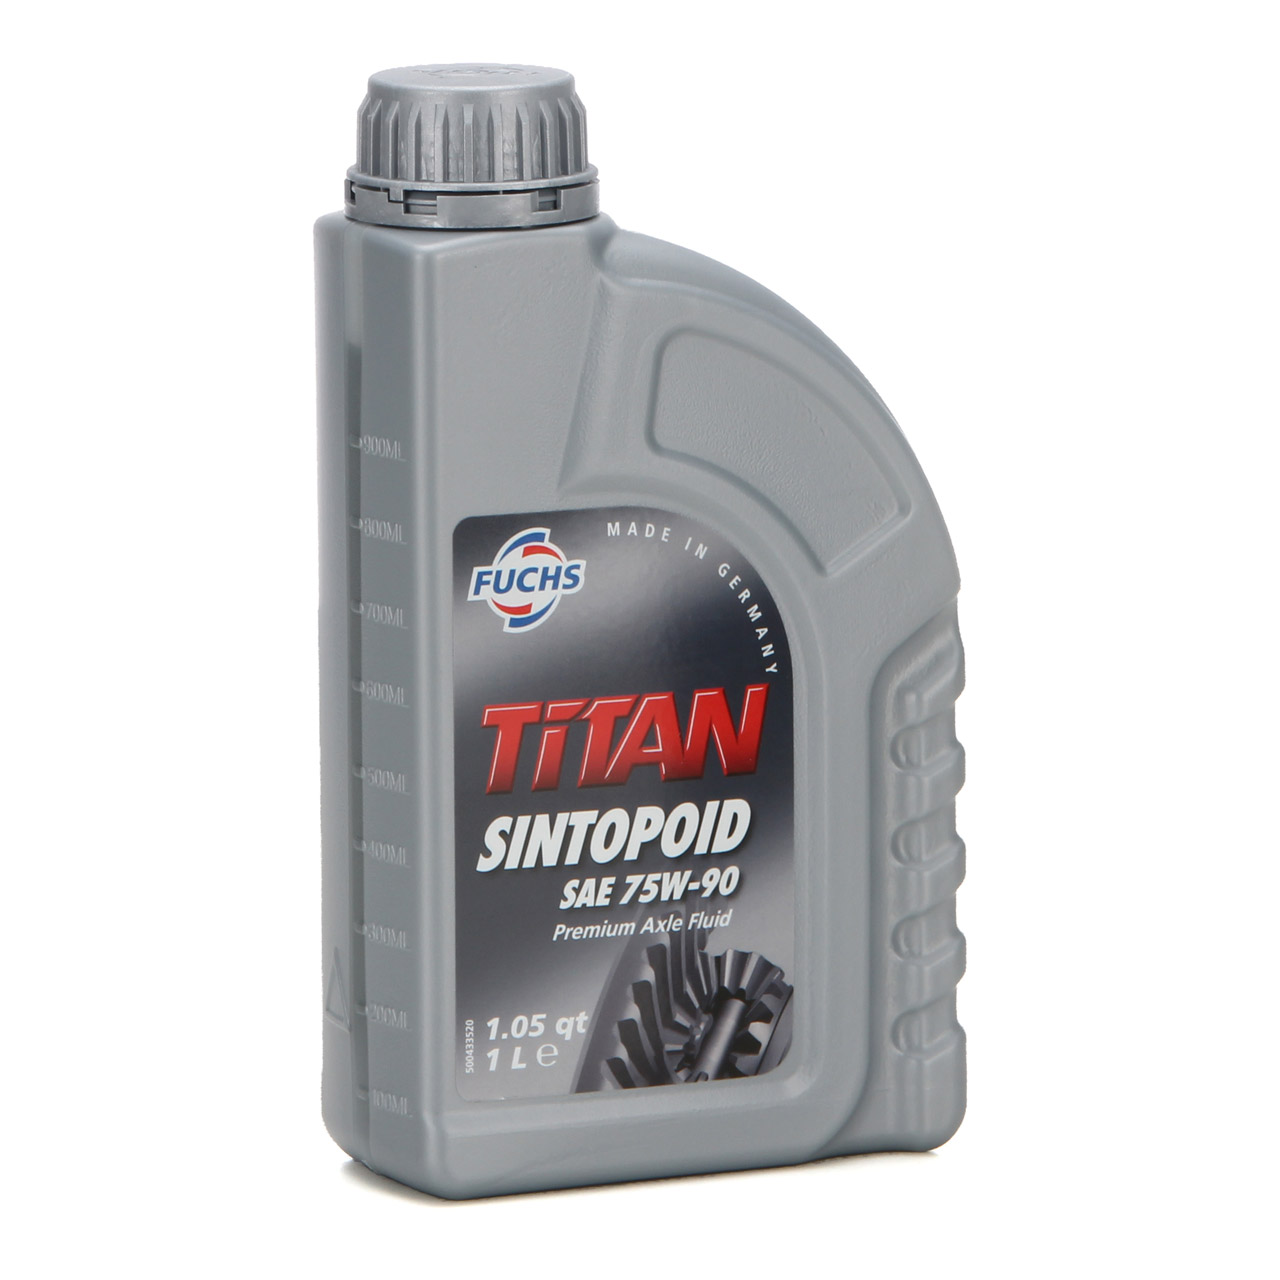 FUCHS Getriebeöl Achsgetriebeöl TITAN SINTOPOID SAE 75W-90 75W90 - 1L 1 Liter